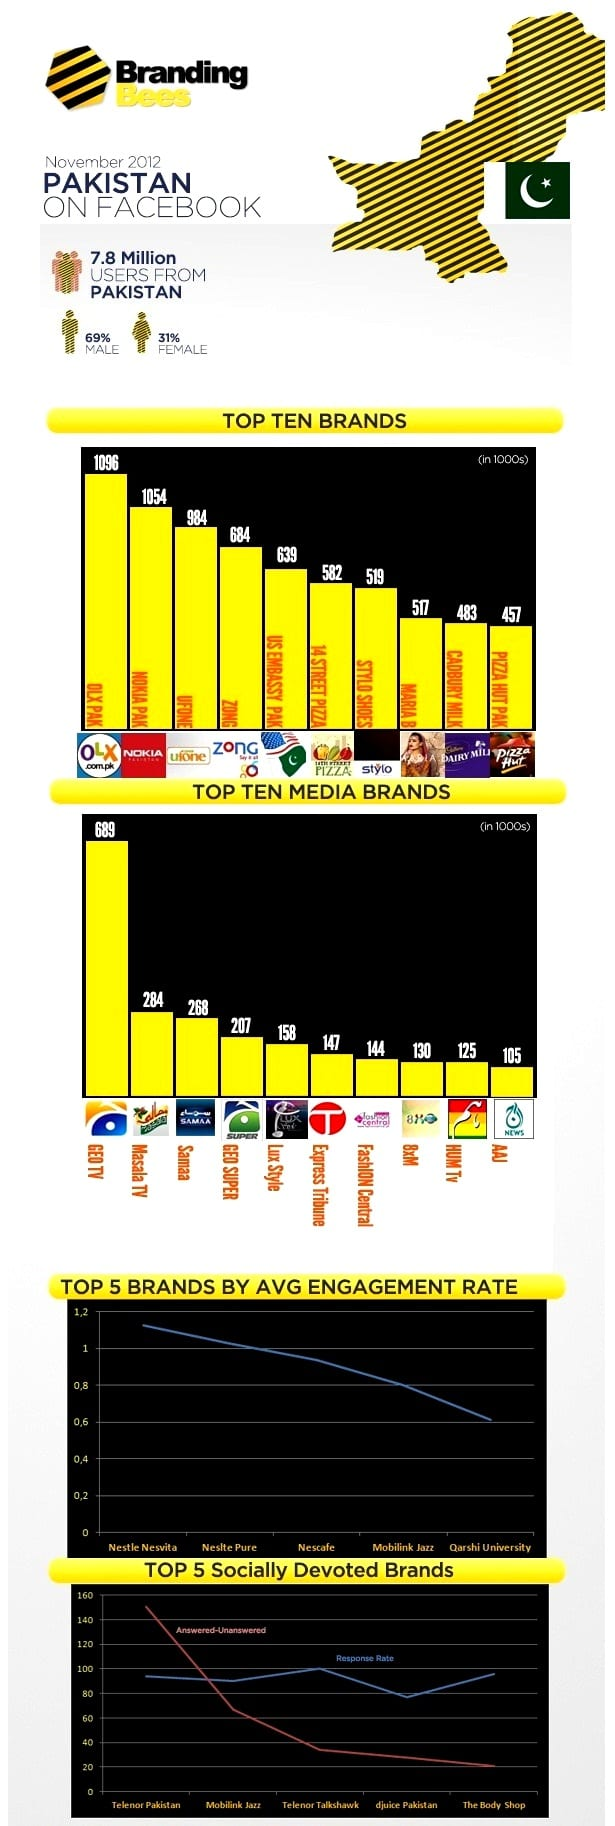 http://phoneworld.com.pk/wp-content/uploads/2012/12/stats.jpg